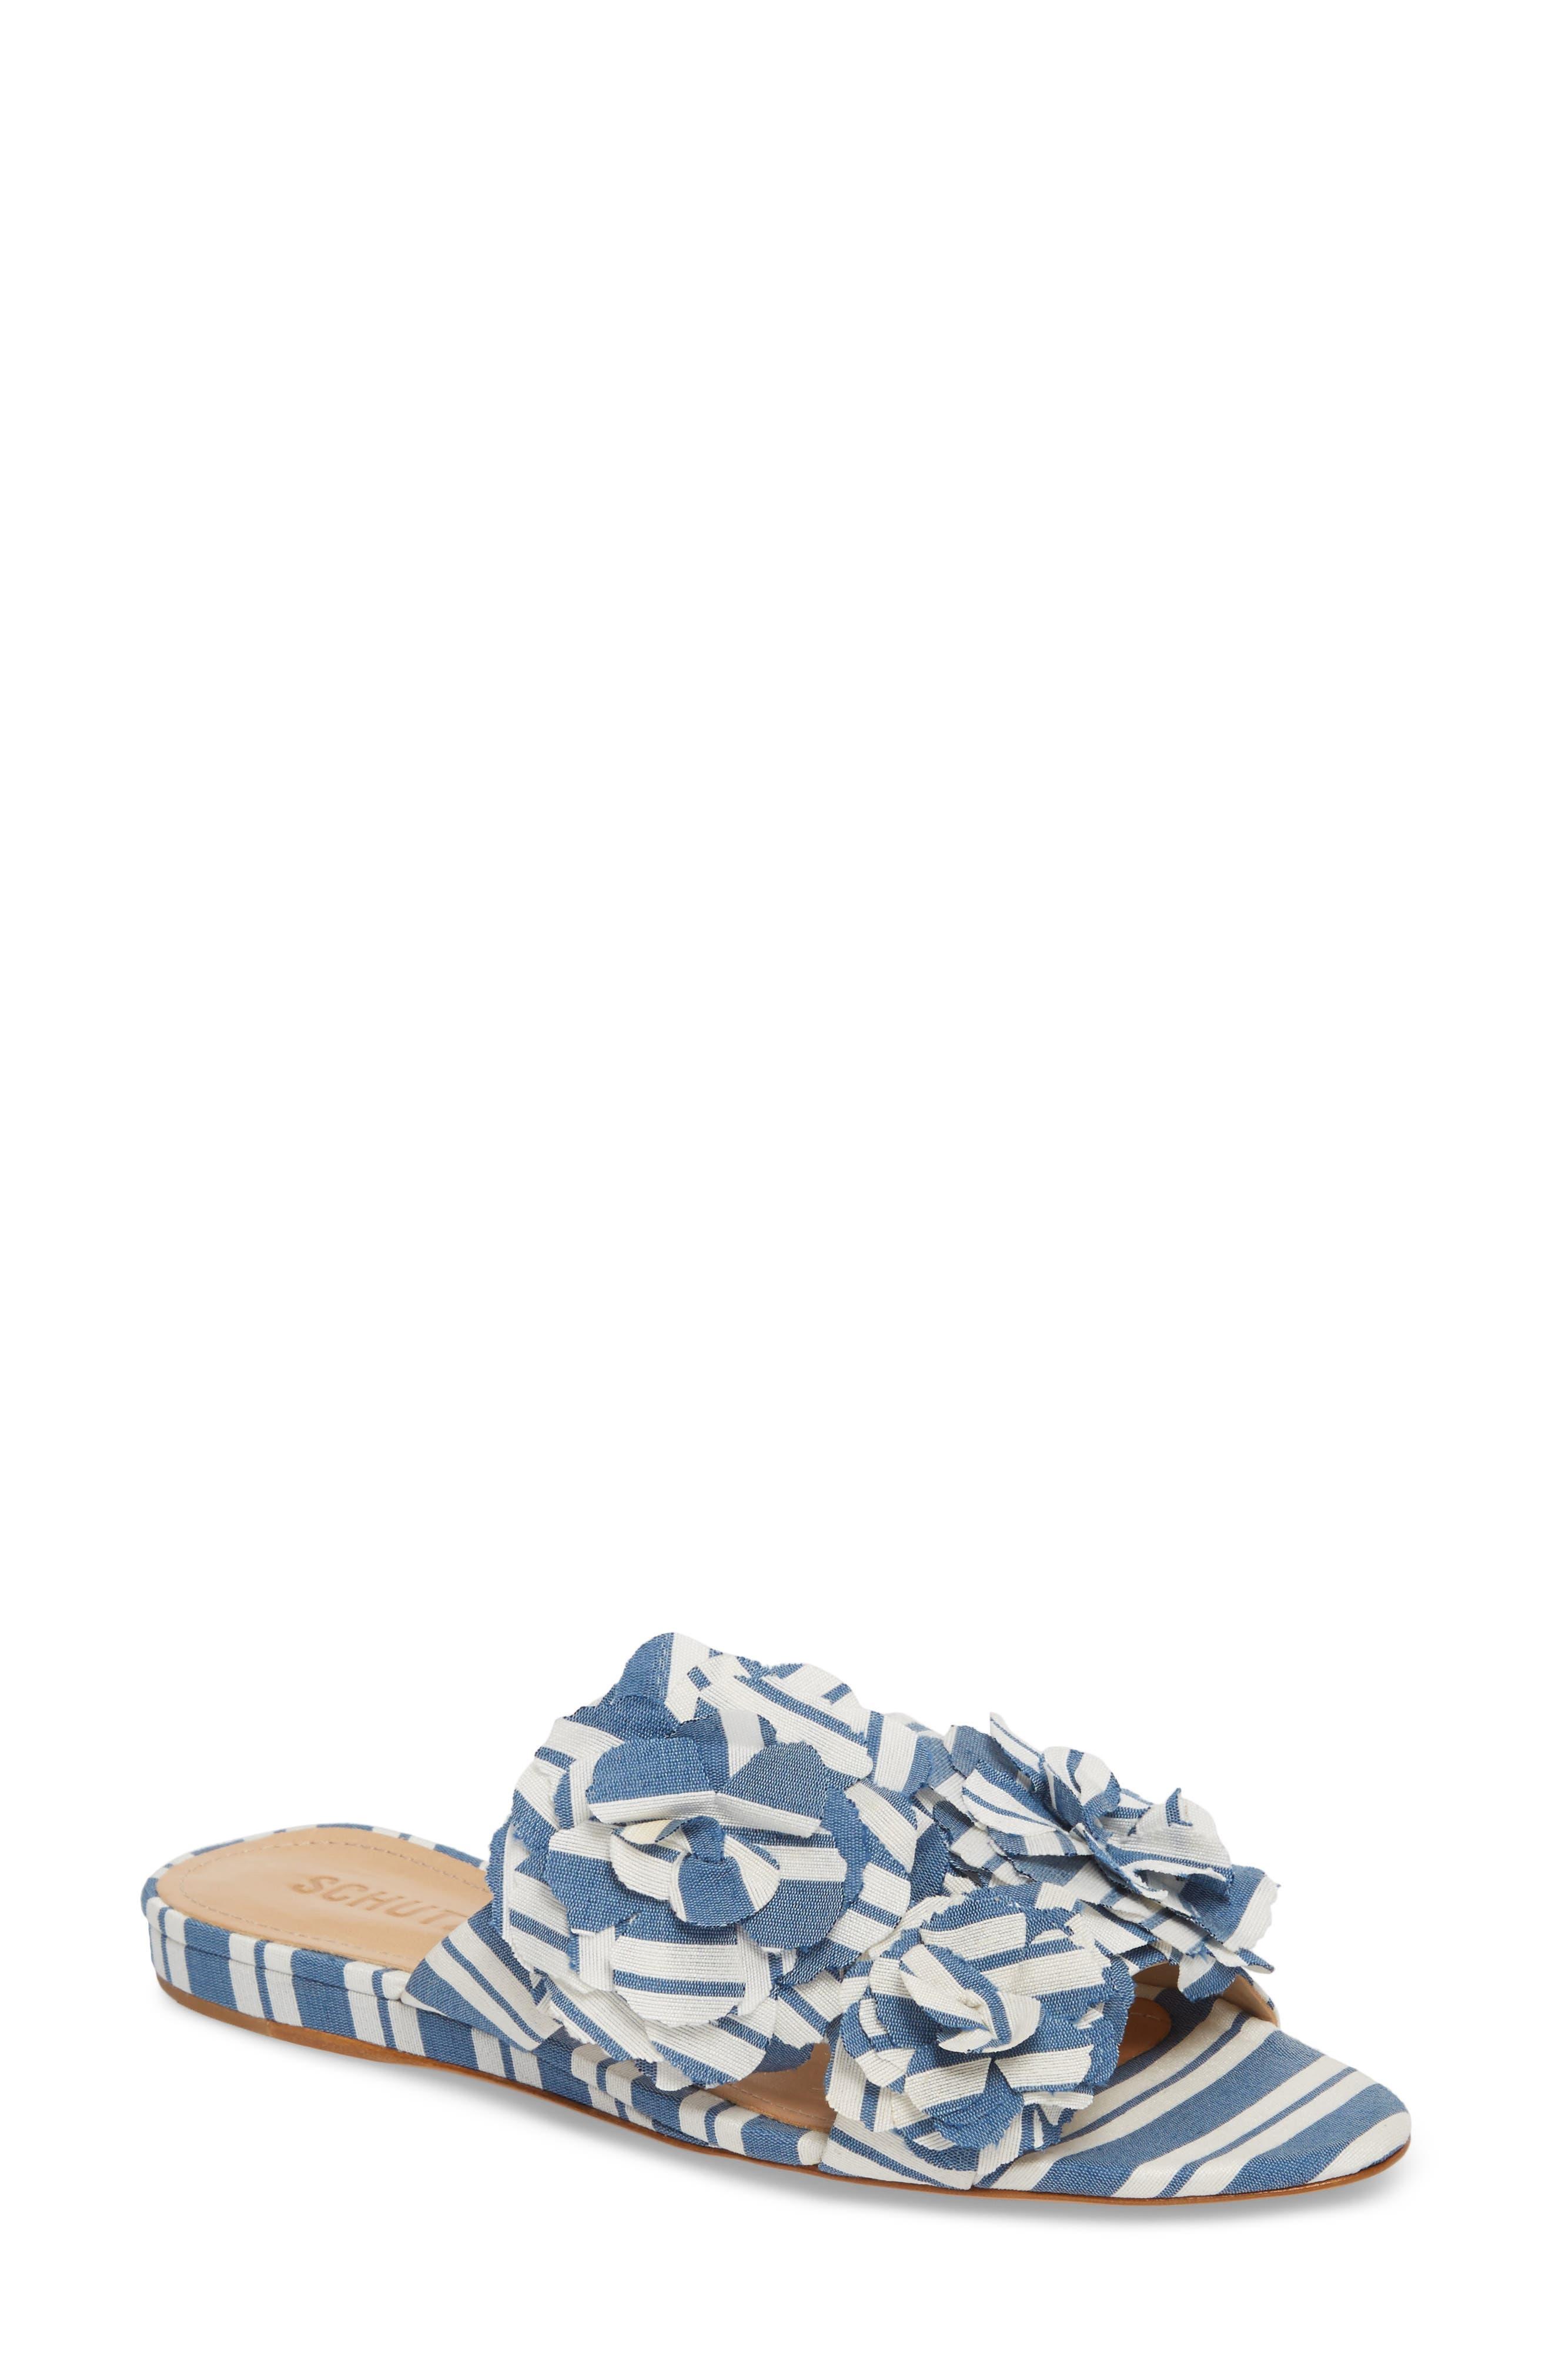 Schutz Ilaria Flower Sandal, Blue